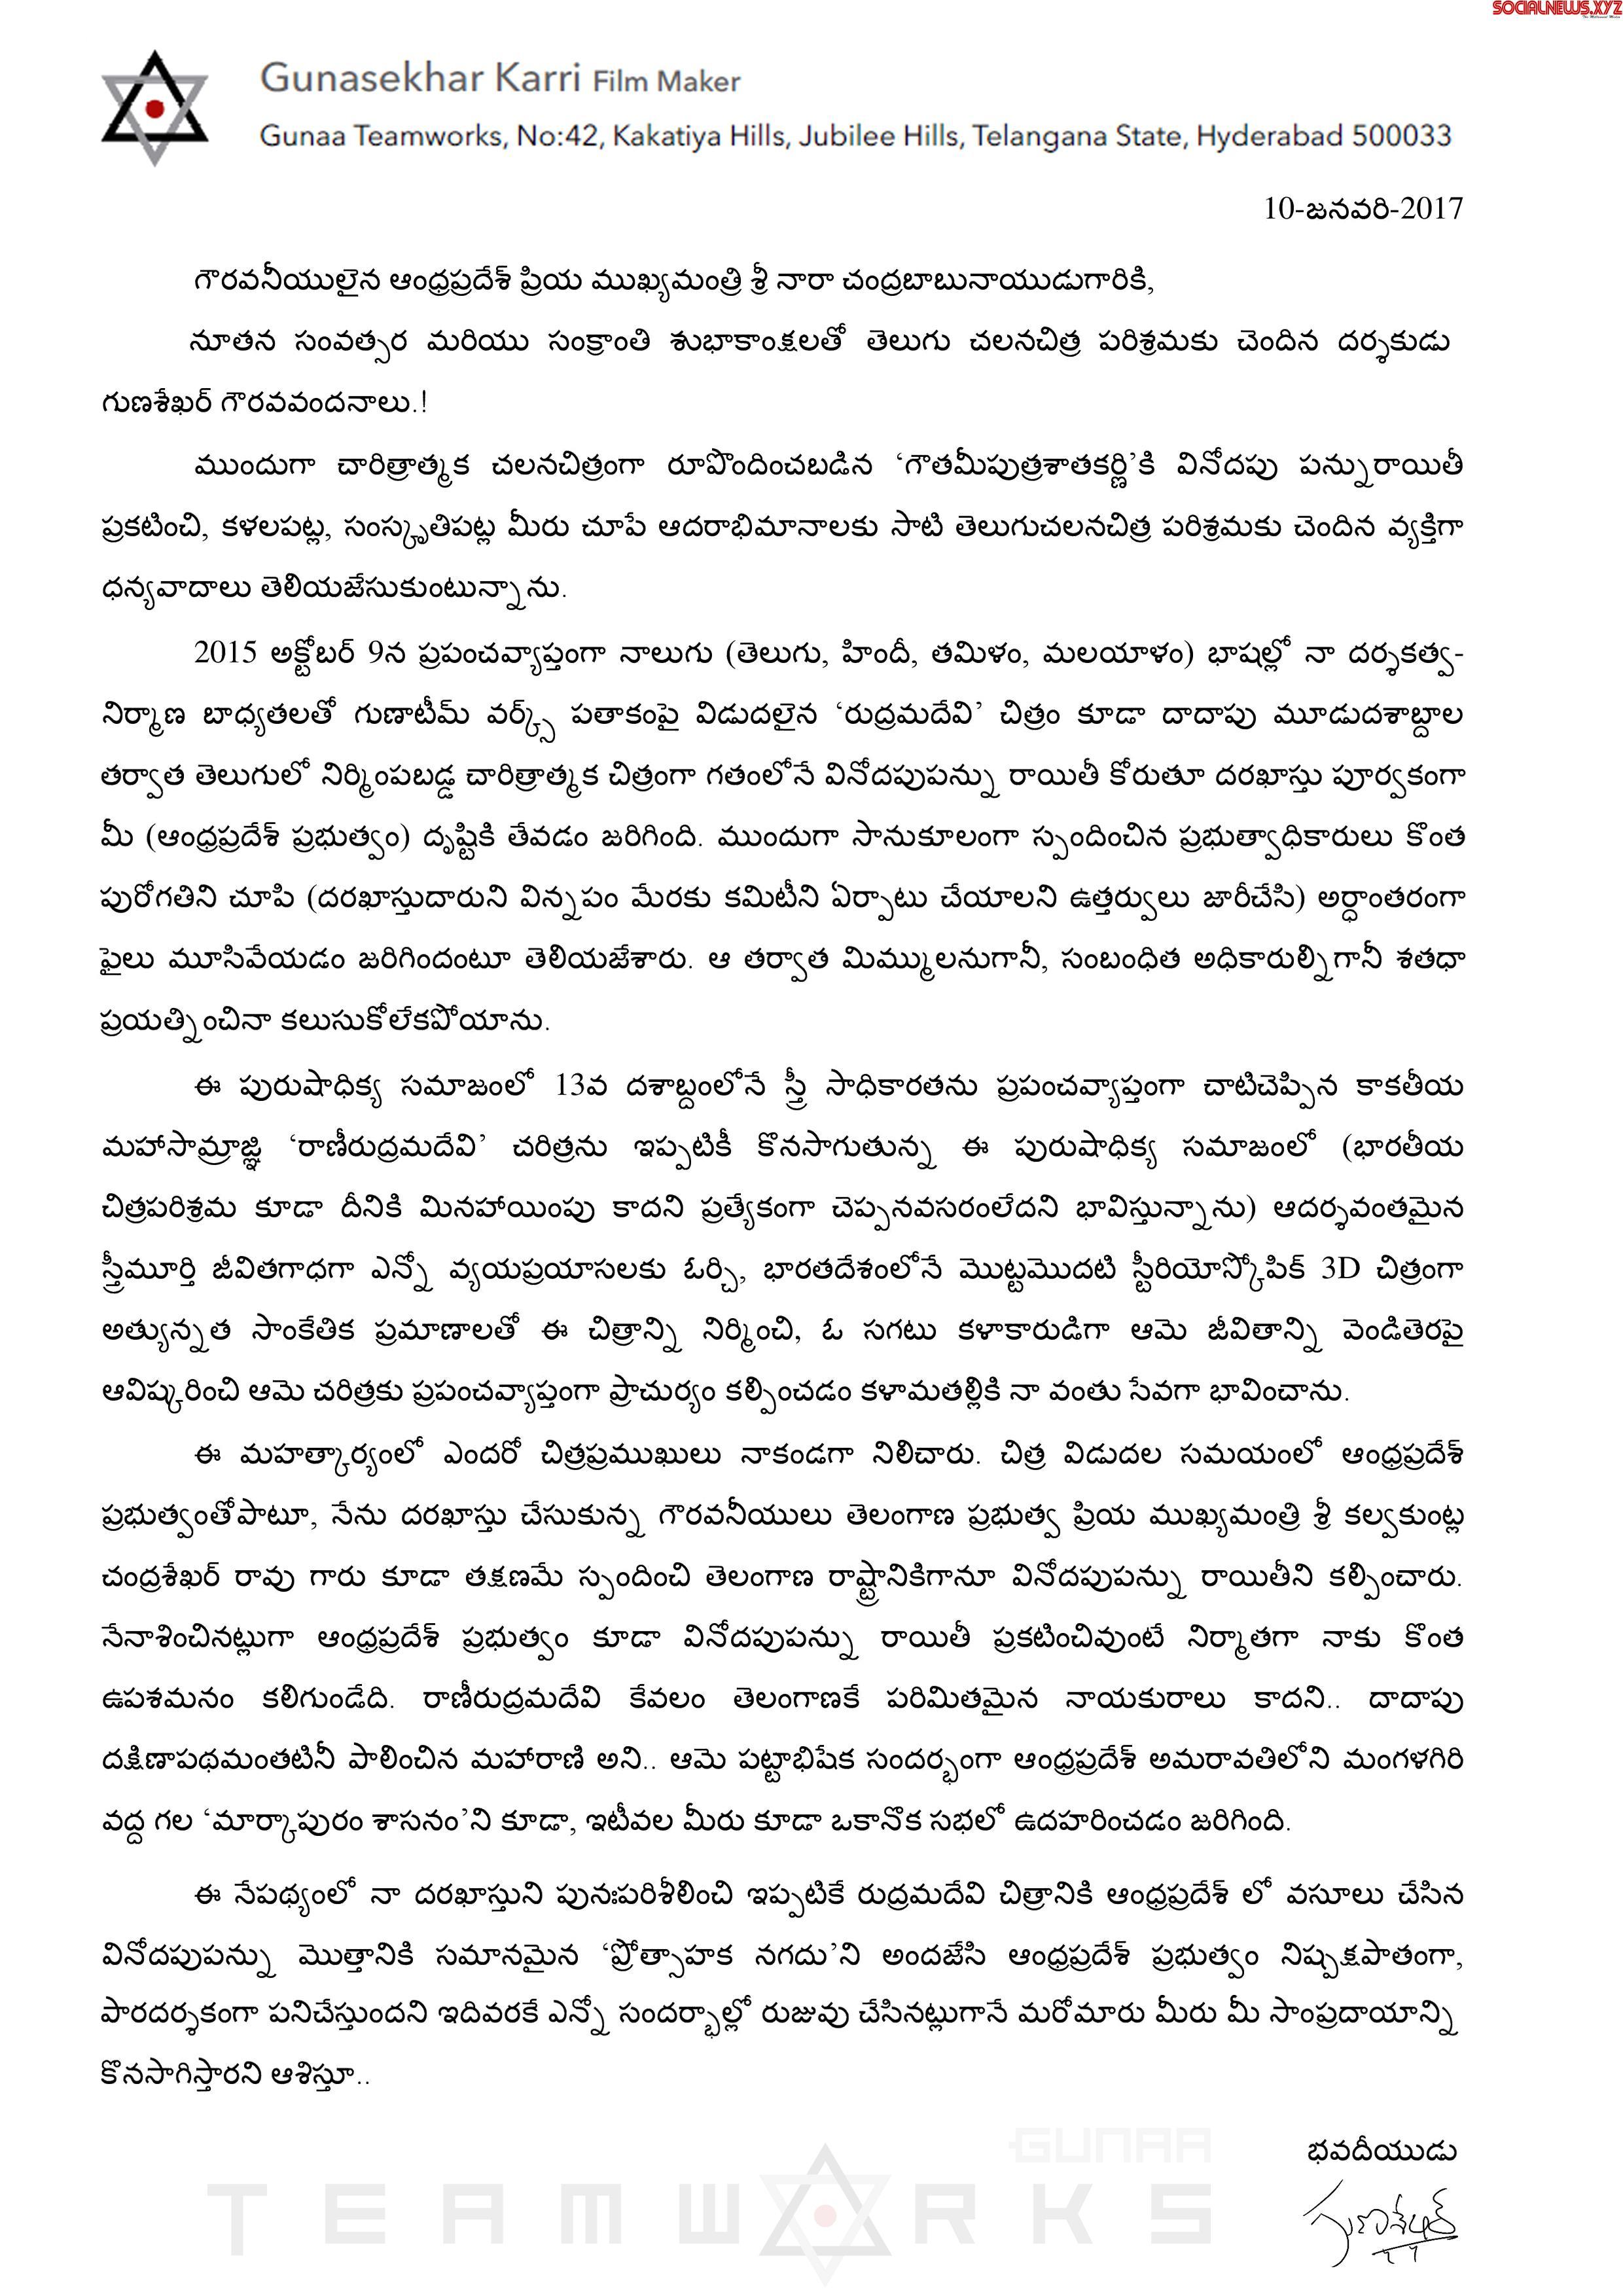 Guna Shekar Letter ... An appeal to the honourable Chief Minister of AP State Mr. N.Chandra Babu Naidu